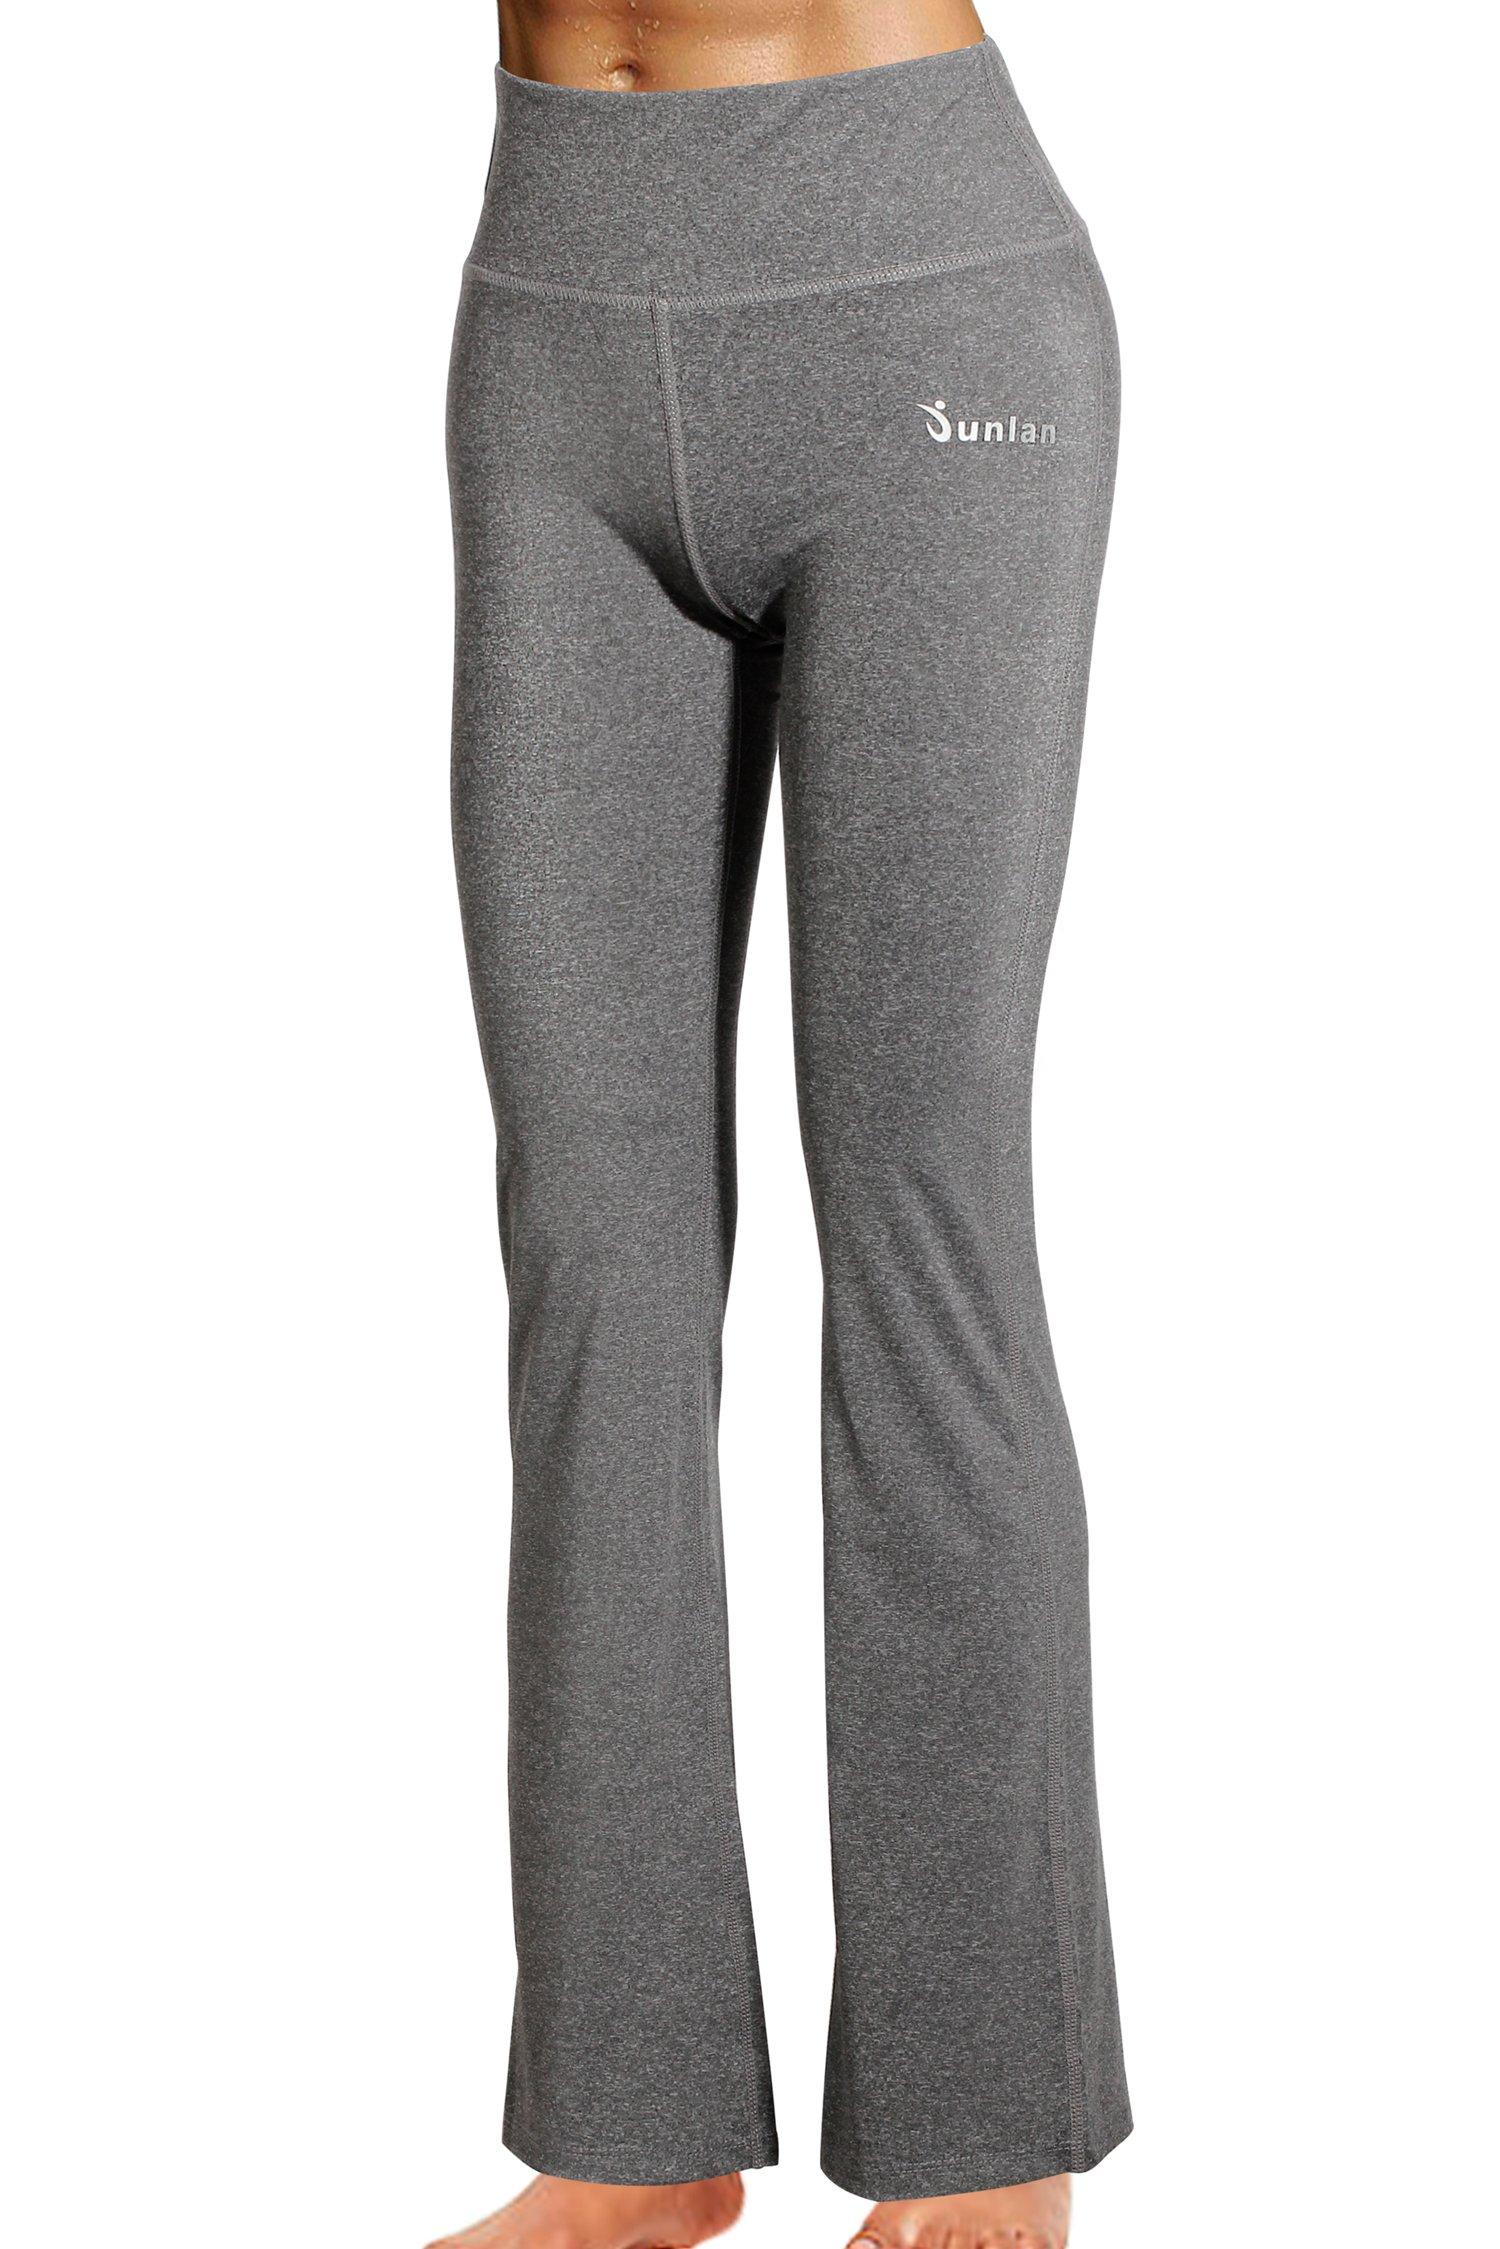 cbd188945e54 Women Yoga Pants Workout Leggings Running Clothes Fitness Boots Capri Wide  Leg Athletic Gym Clothing Stretch